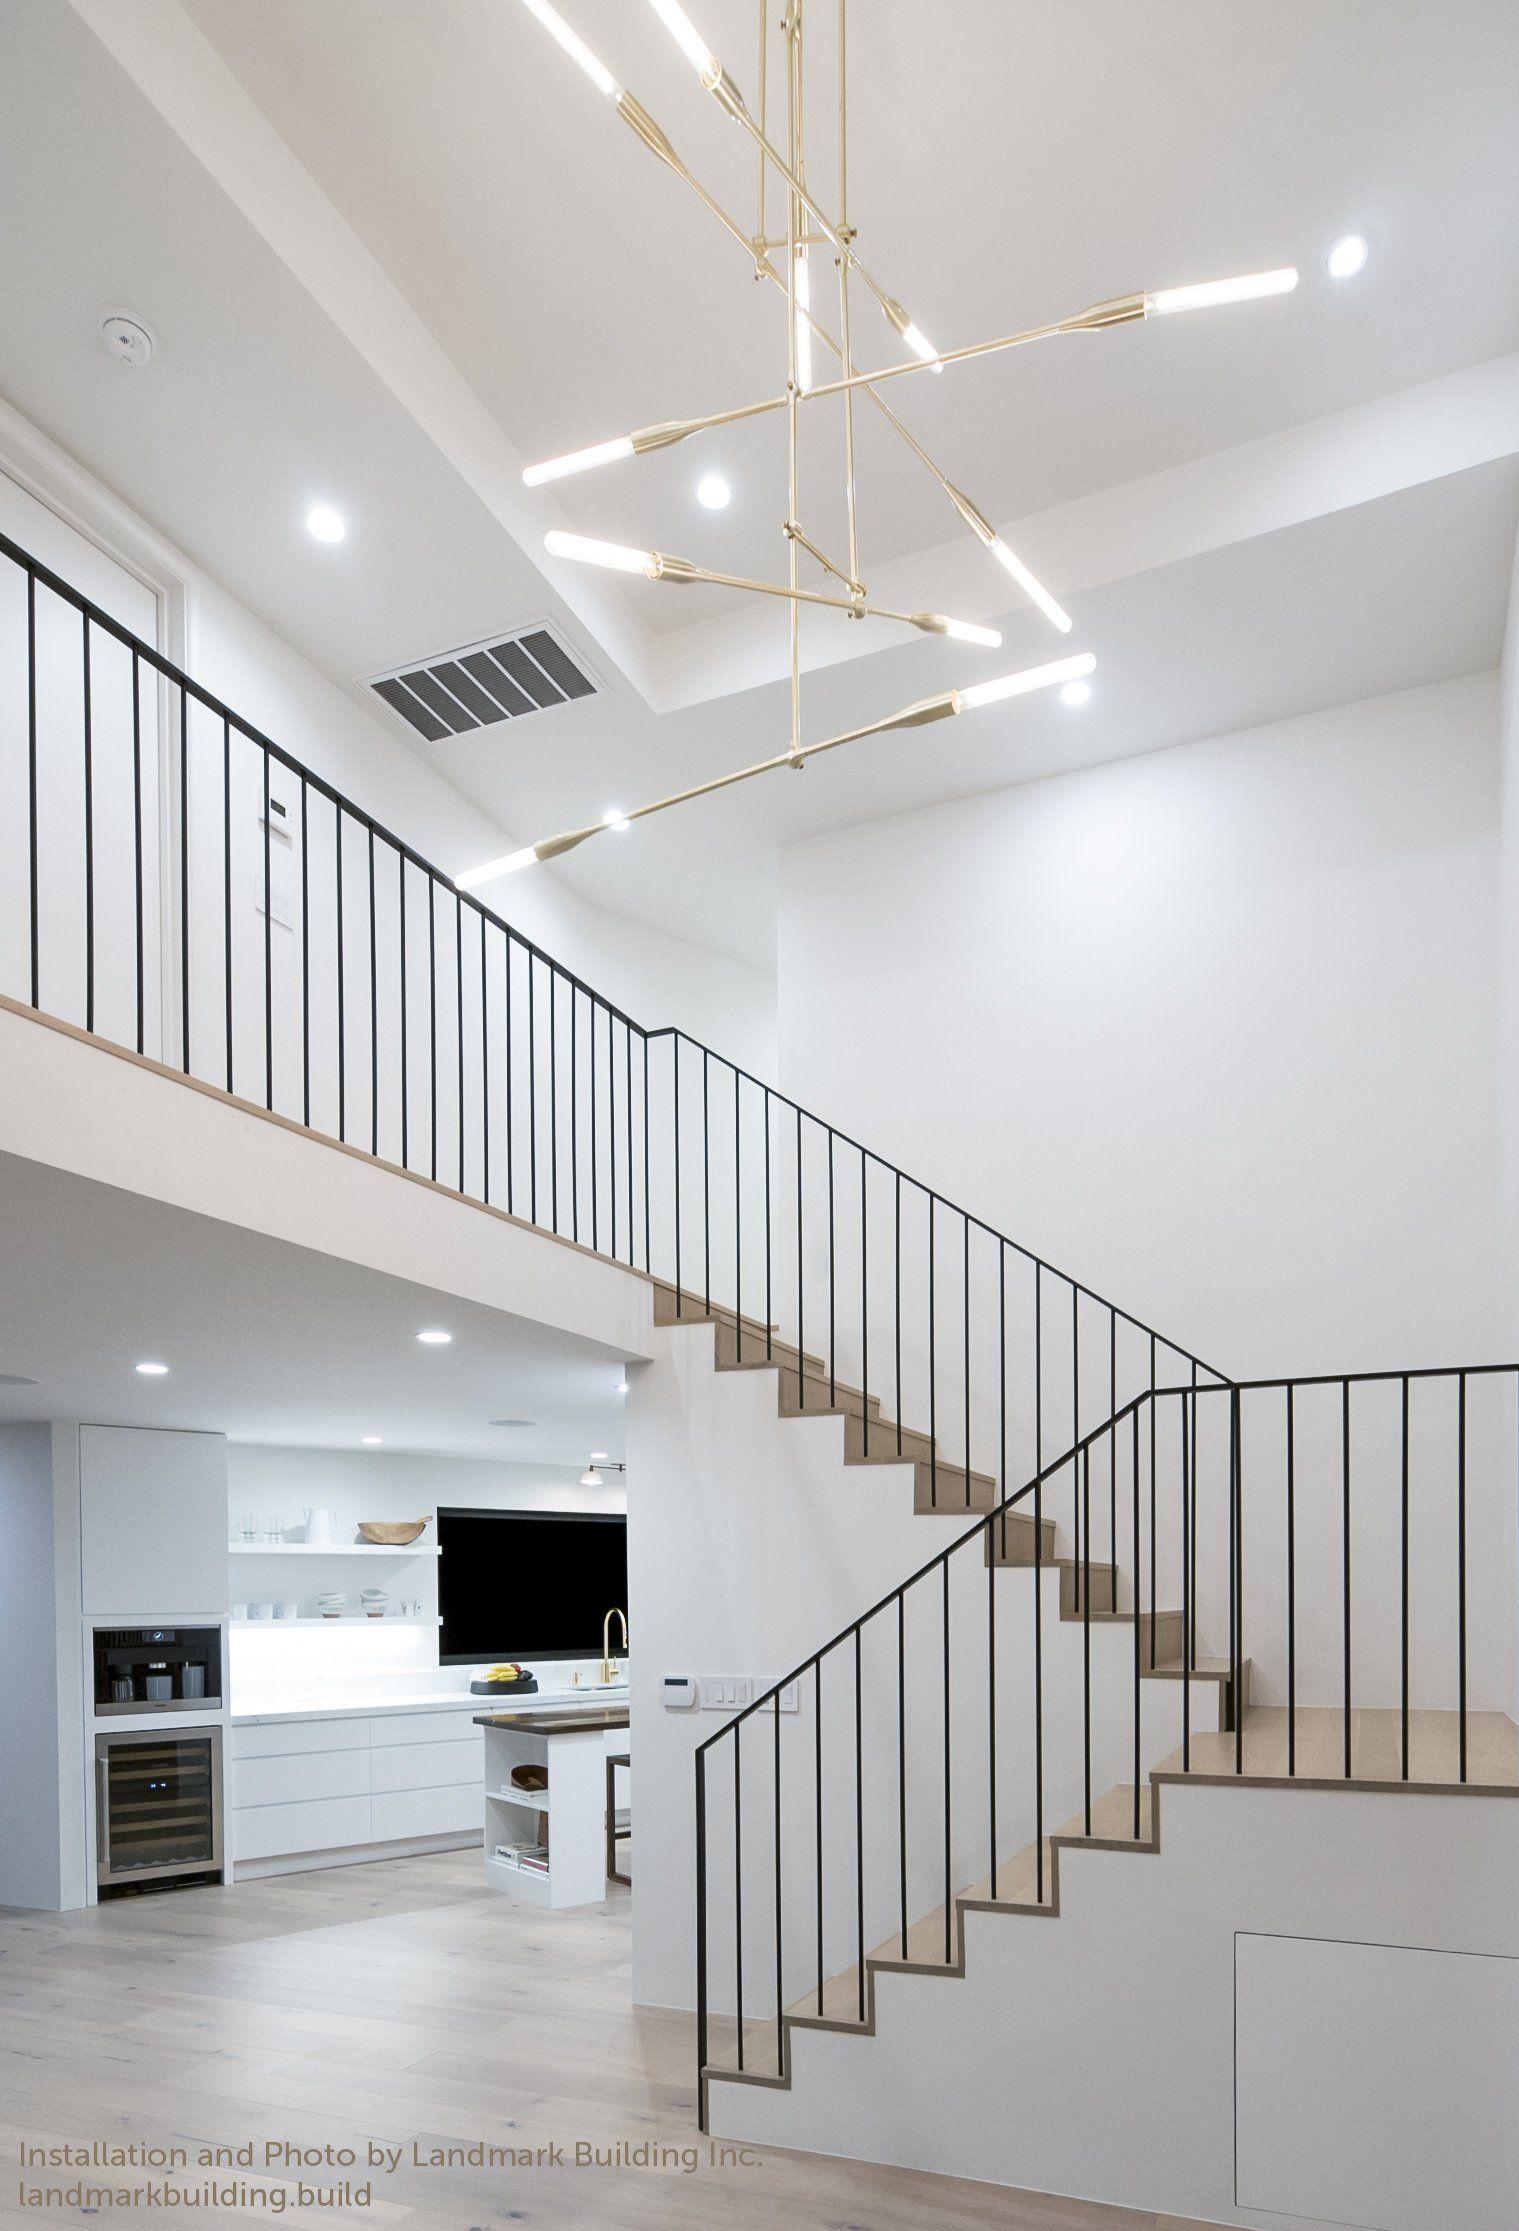 Lighting Basement Washroom Stairs: C L I E N T : L A S - L O M A S In 2019